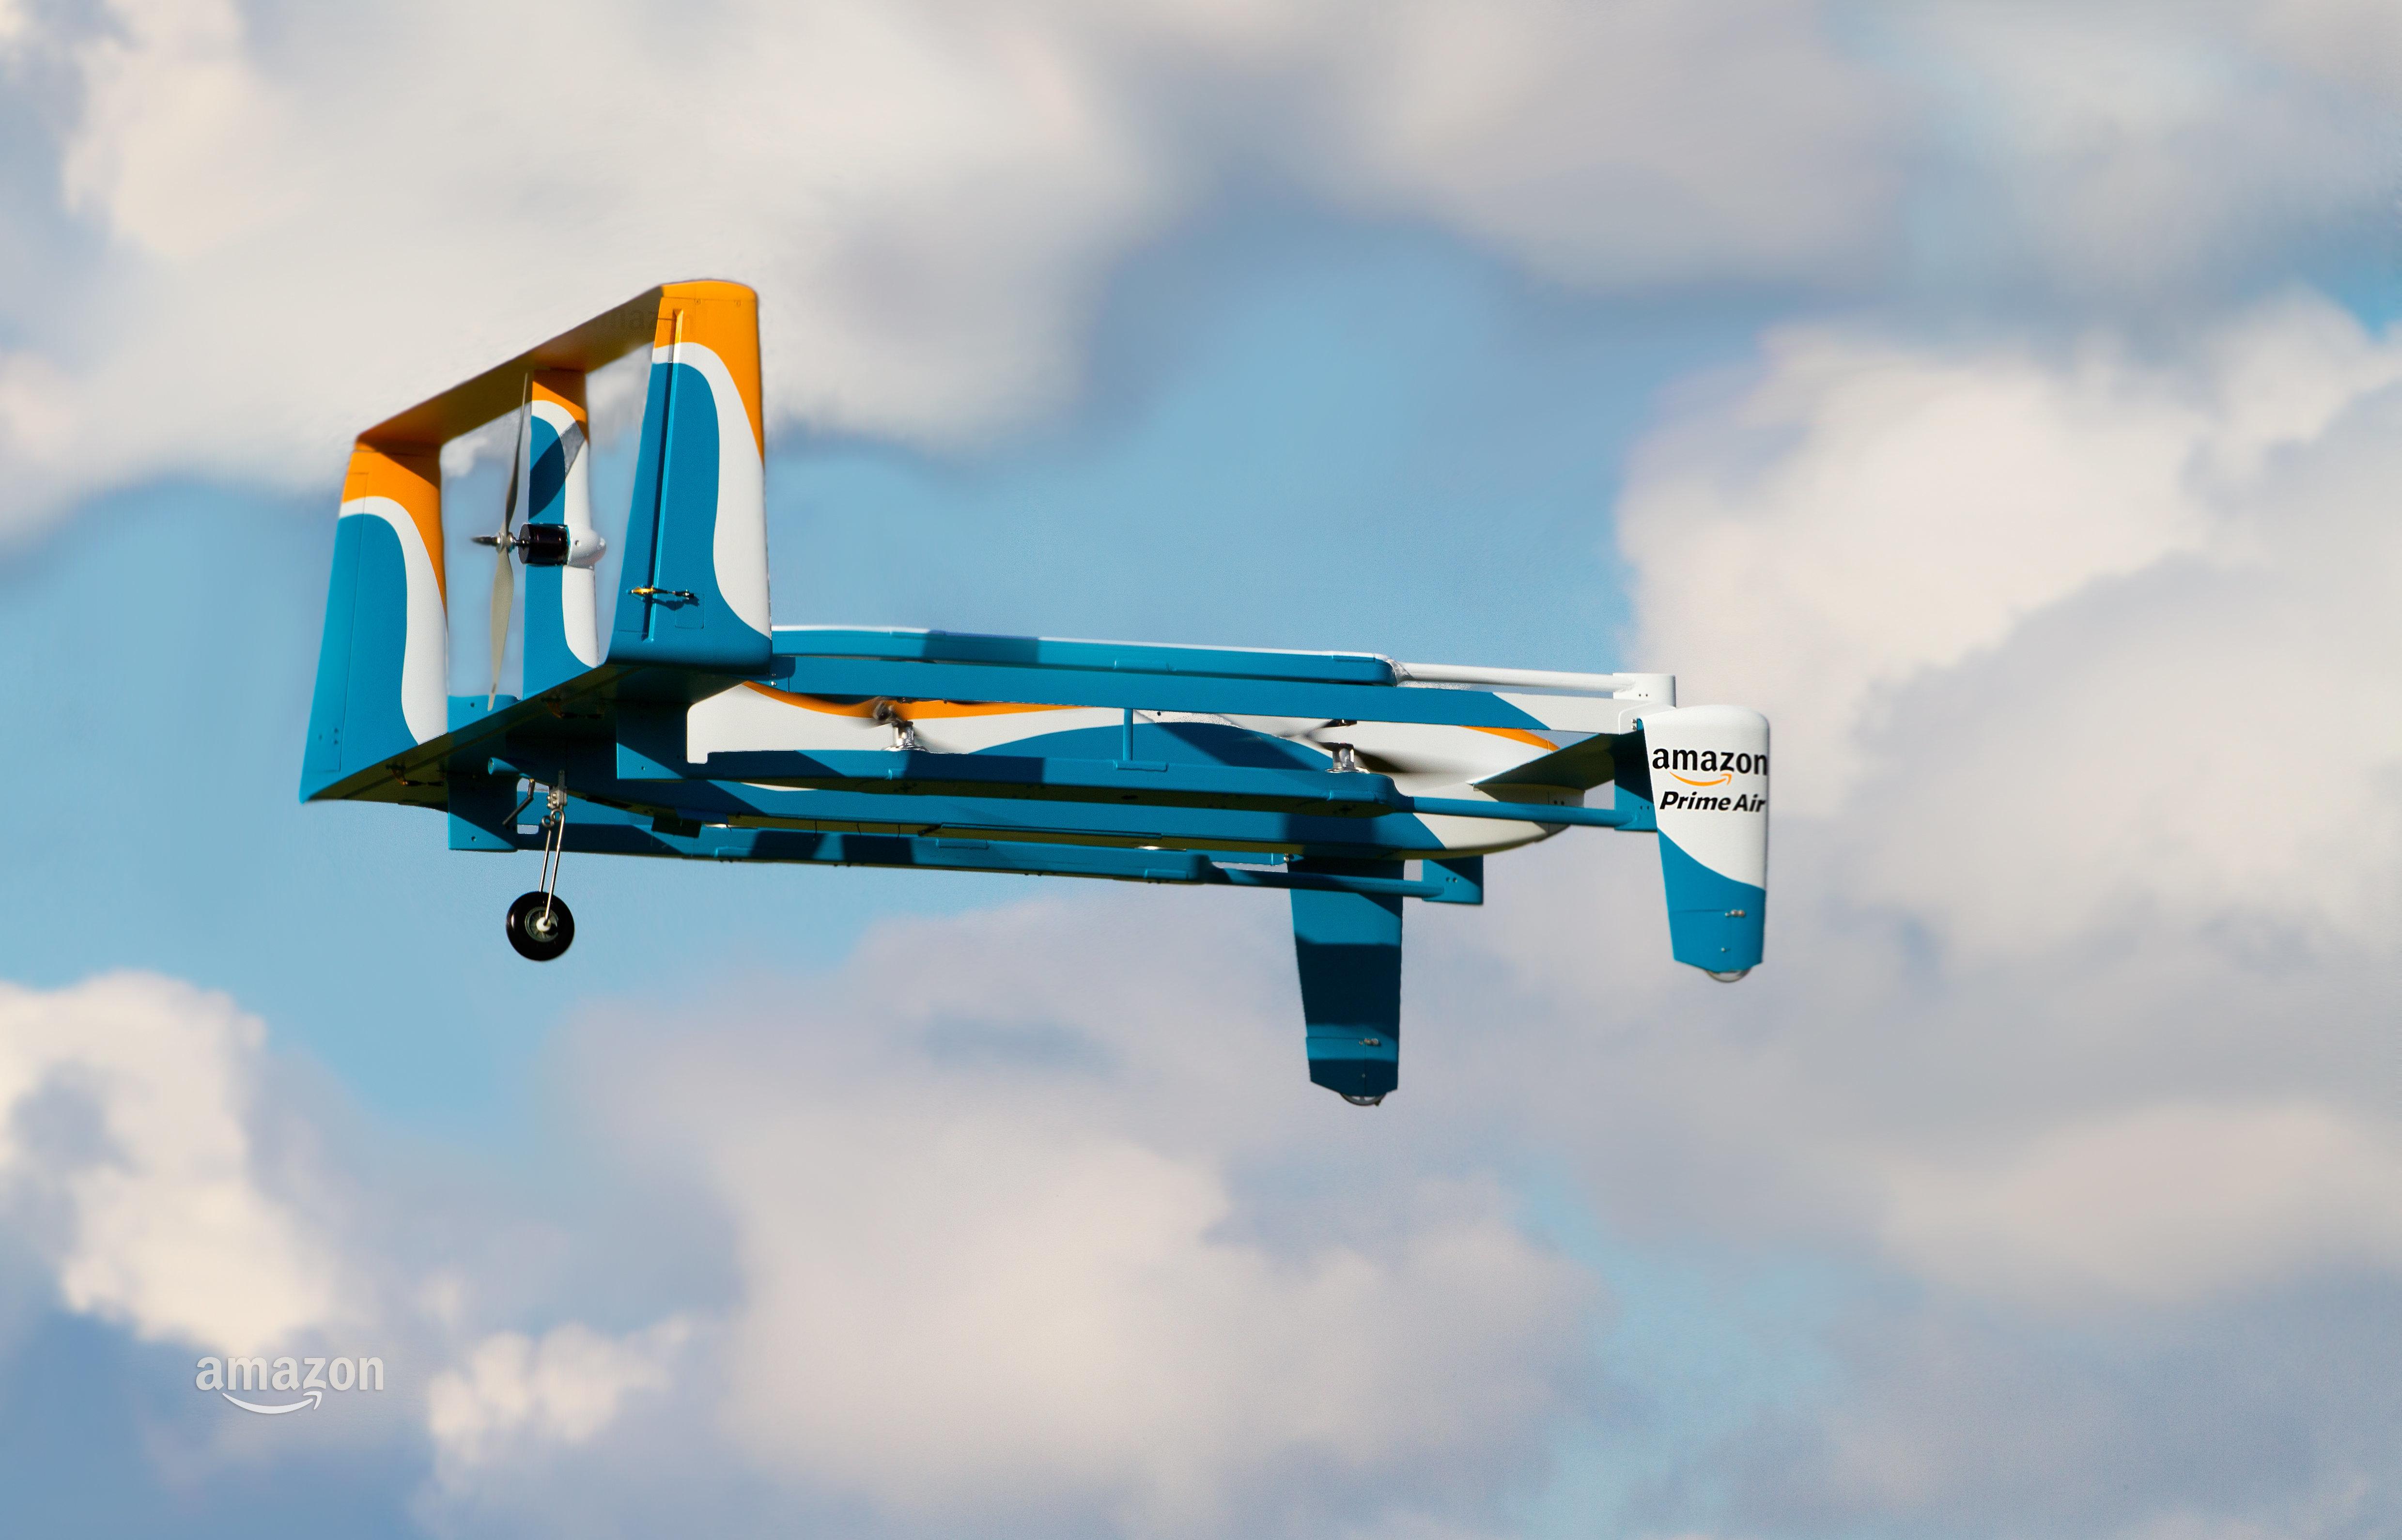 Amazon's Prime Air delivery drone